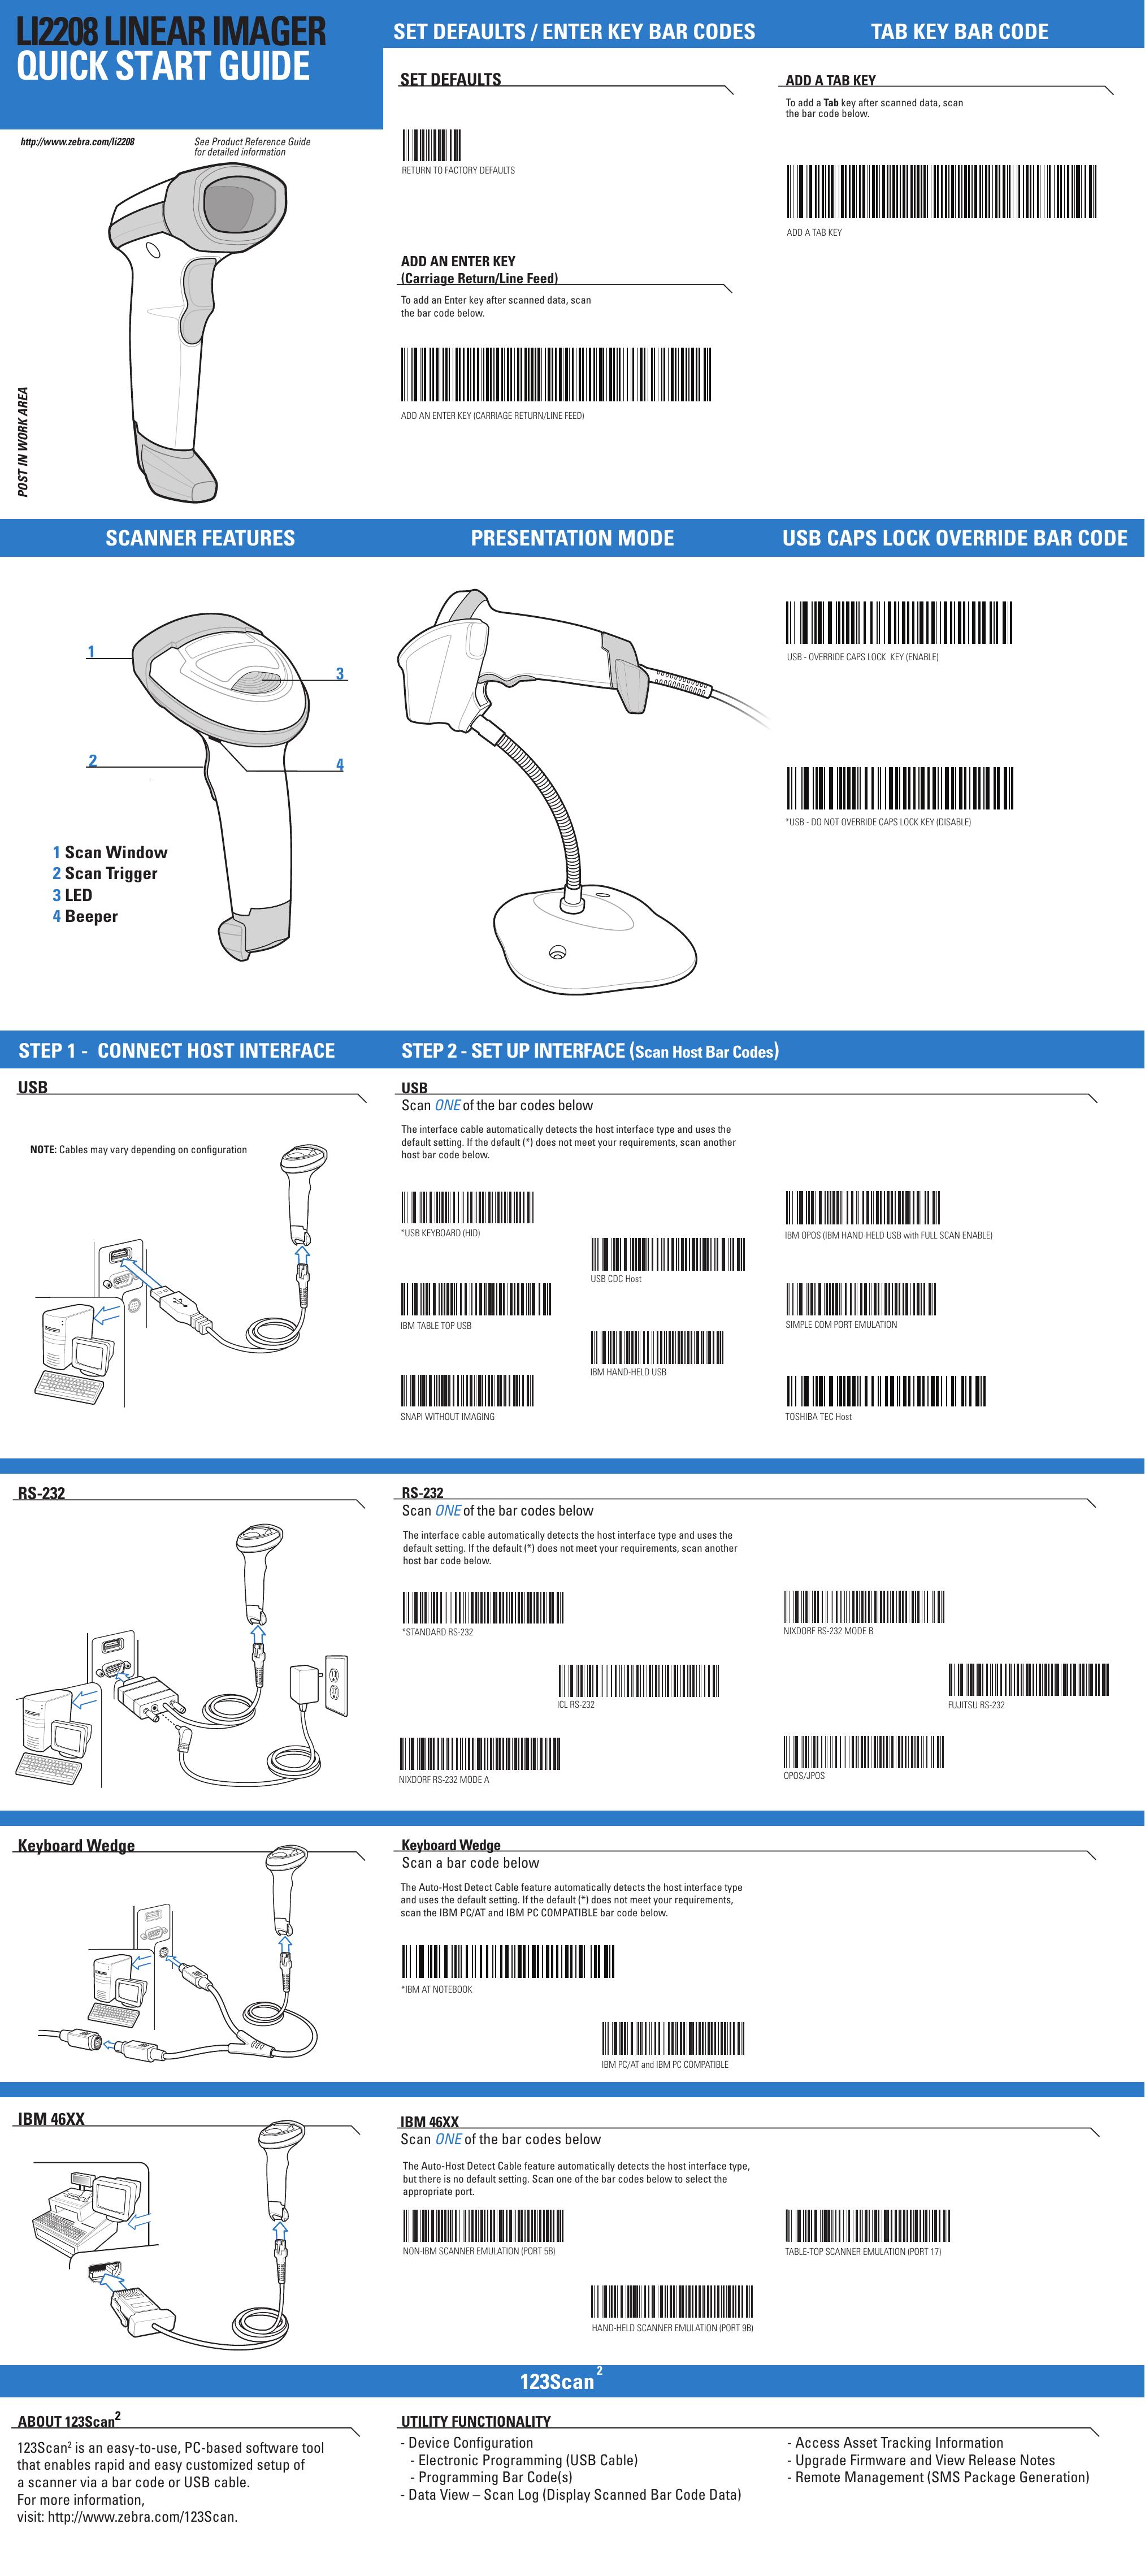 LI2208 Linear Imager Quick Start Guide (en) | manualzz com